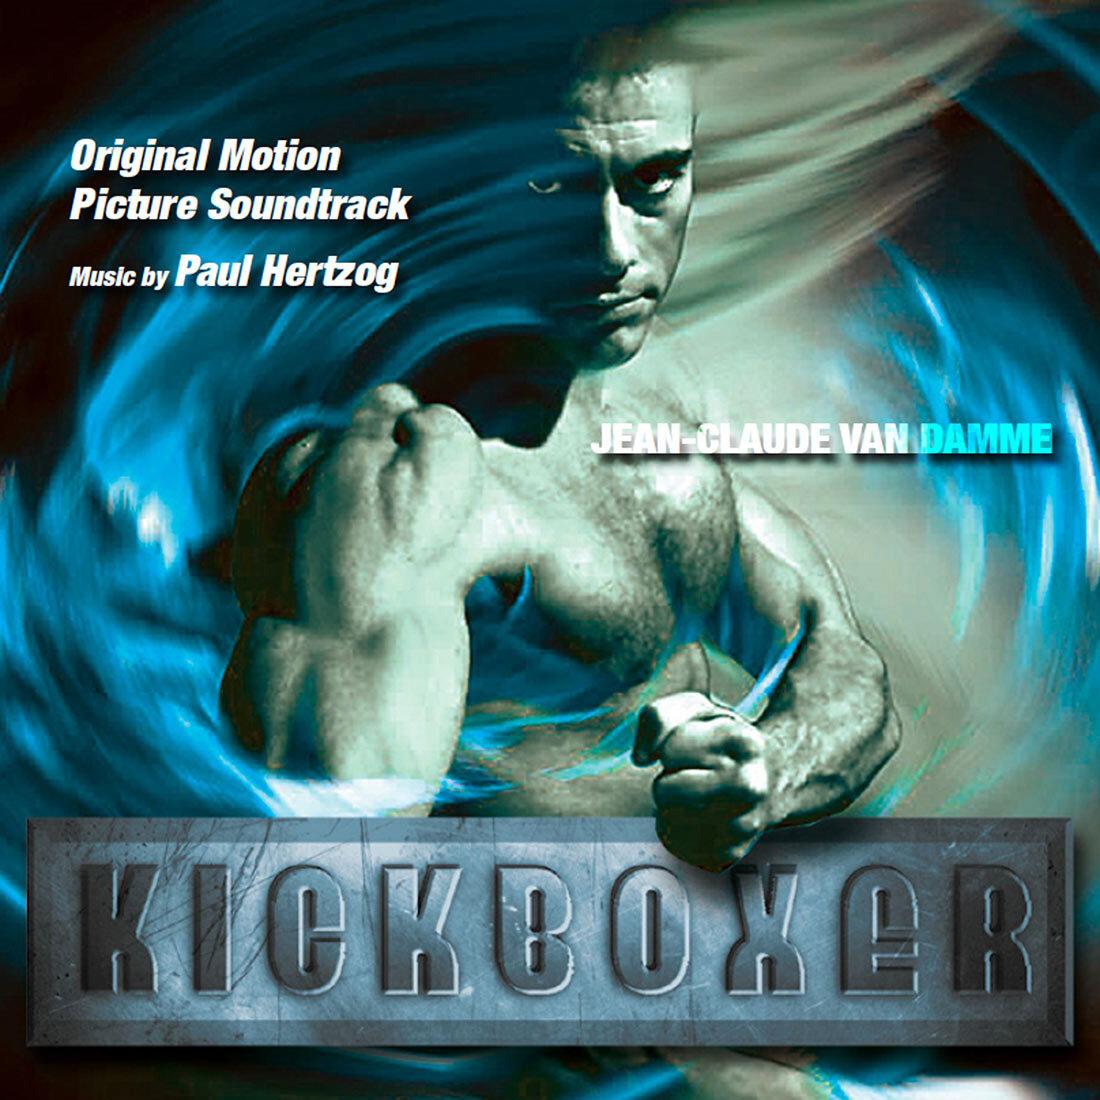 Kickboxer Original Motion Picture Soundtrack Deluxe CD Edition with Bonus Tracks